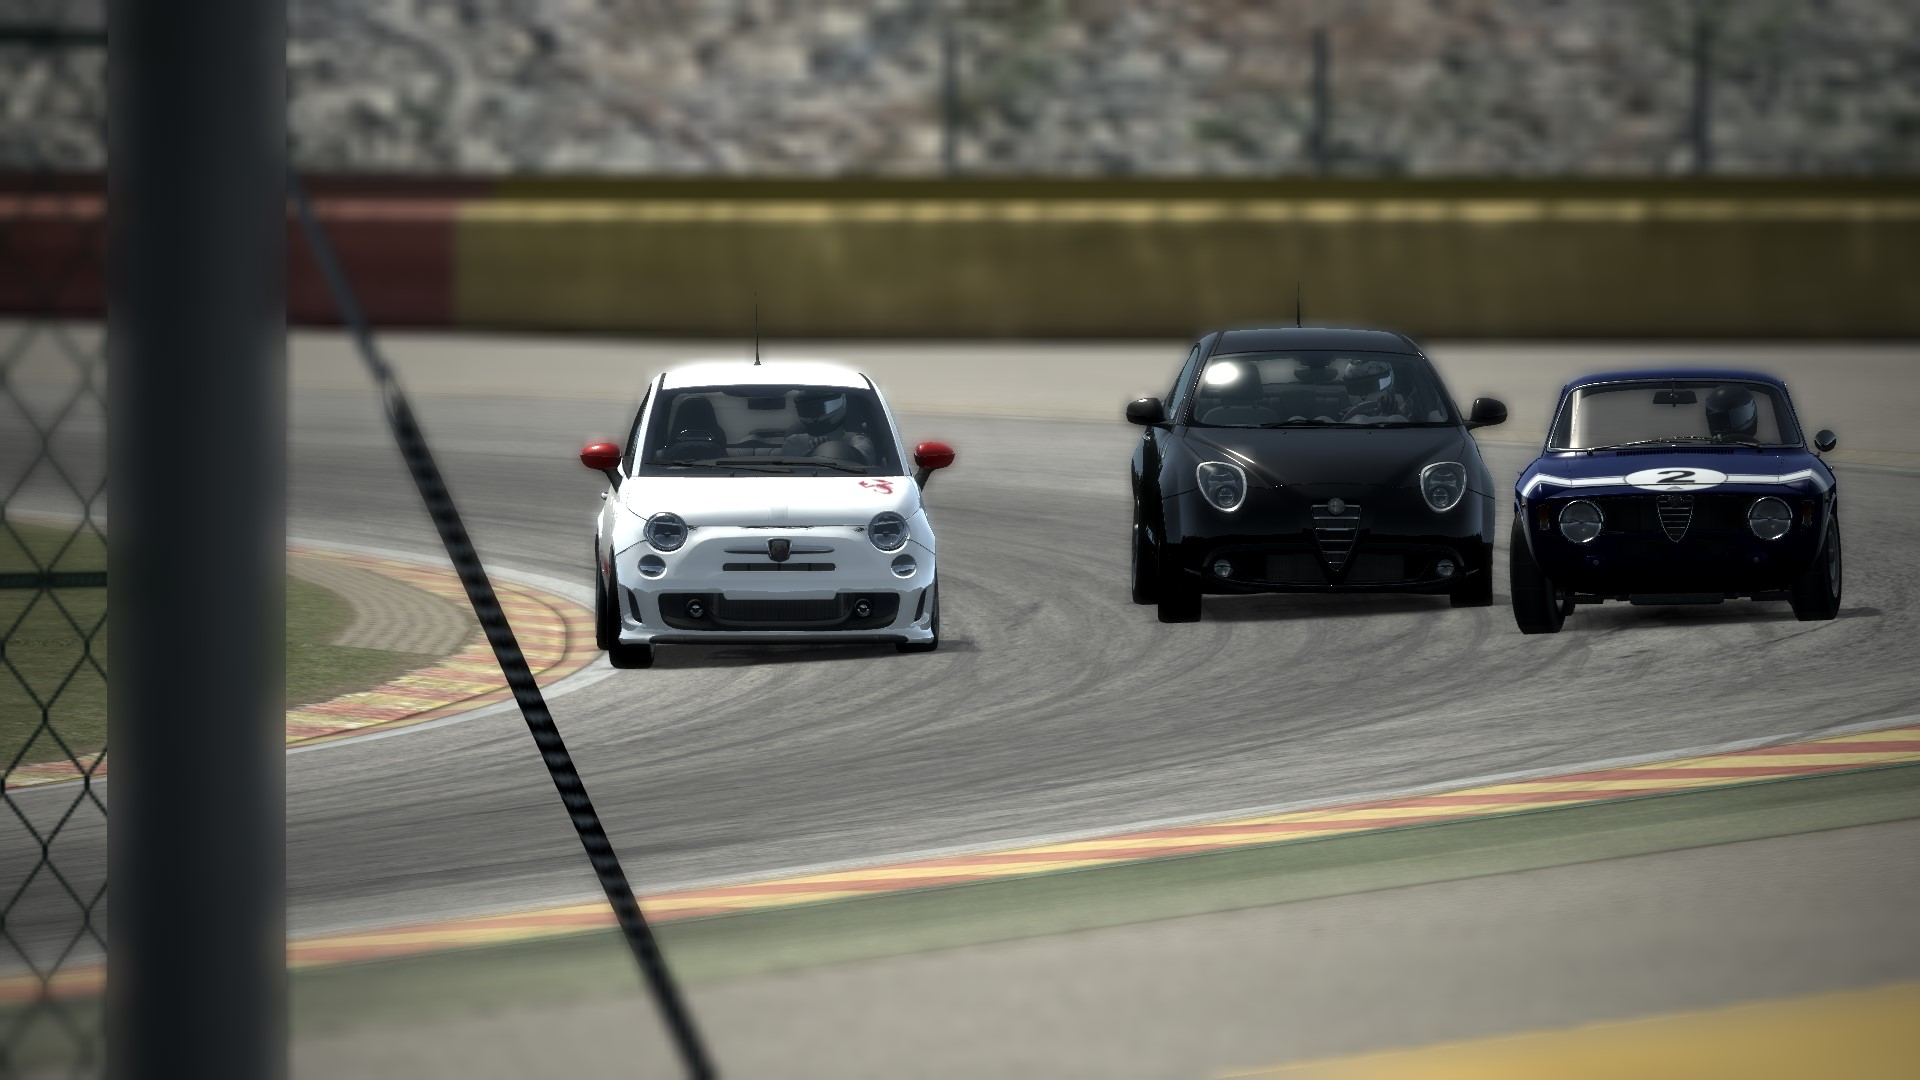 AC_Racing Club